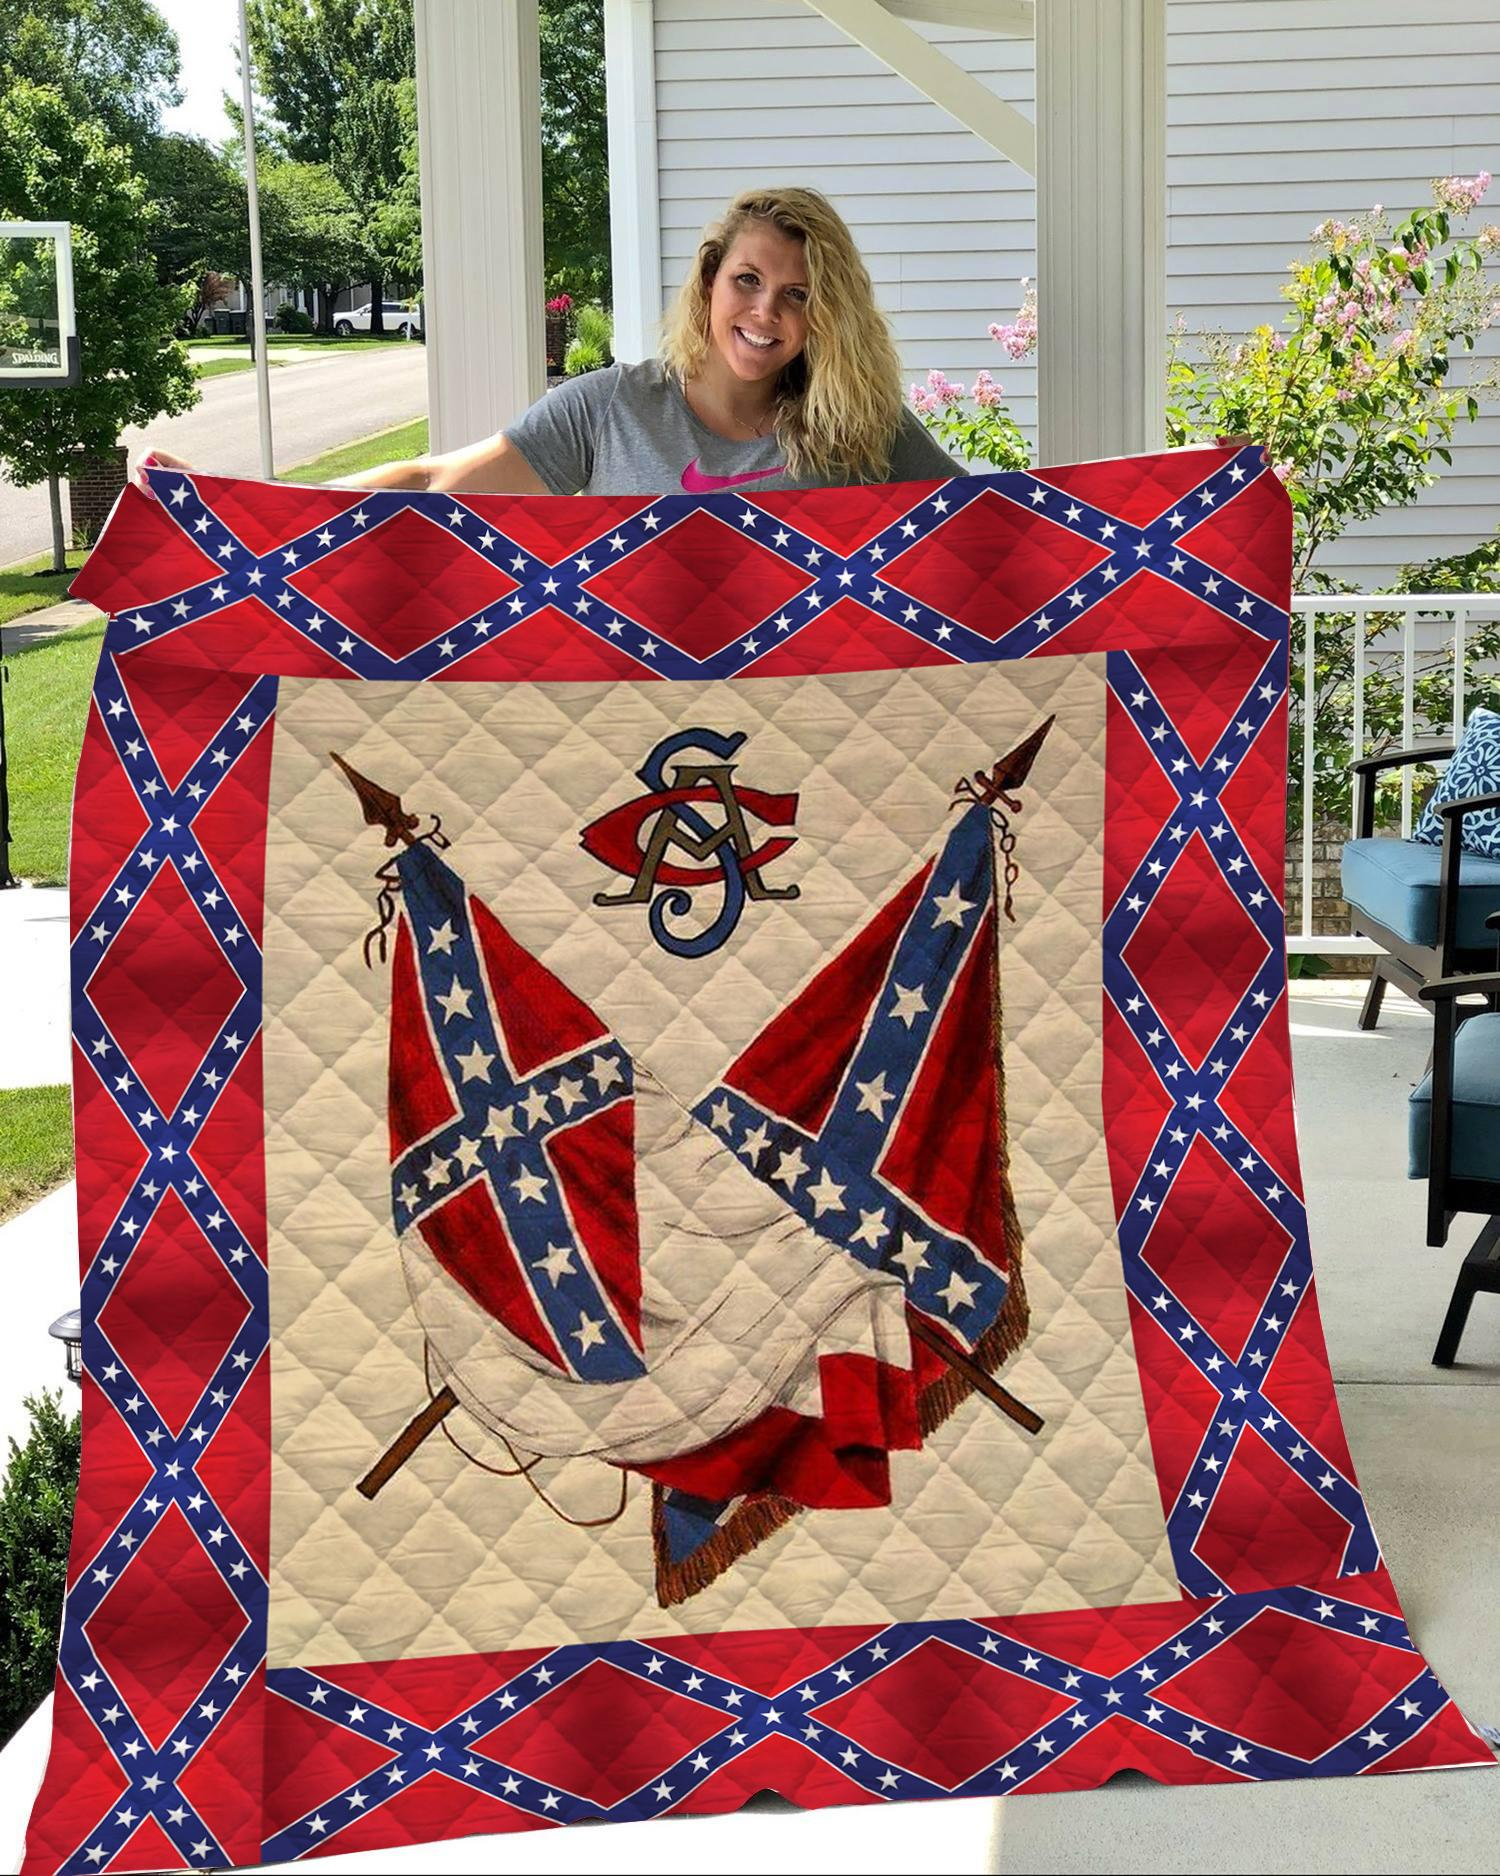 [Top-selling] Redneck confederate flag 3d quilt - maria